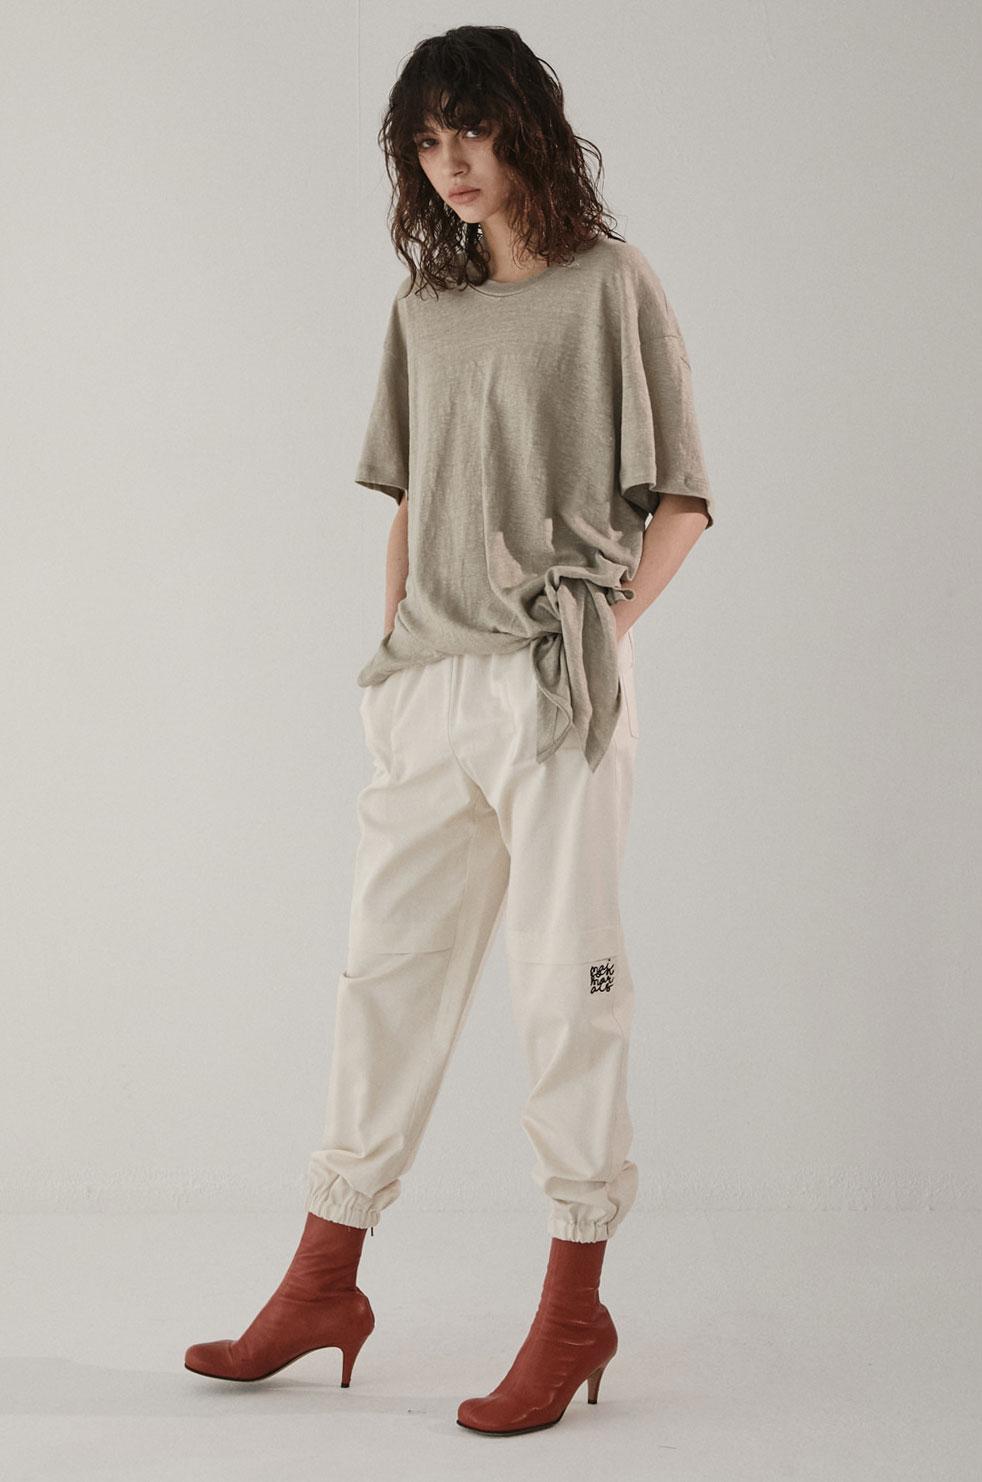 MAISON MARAIS女装品牌2020秋季慵懒风不规则T恤